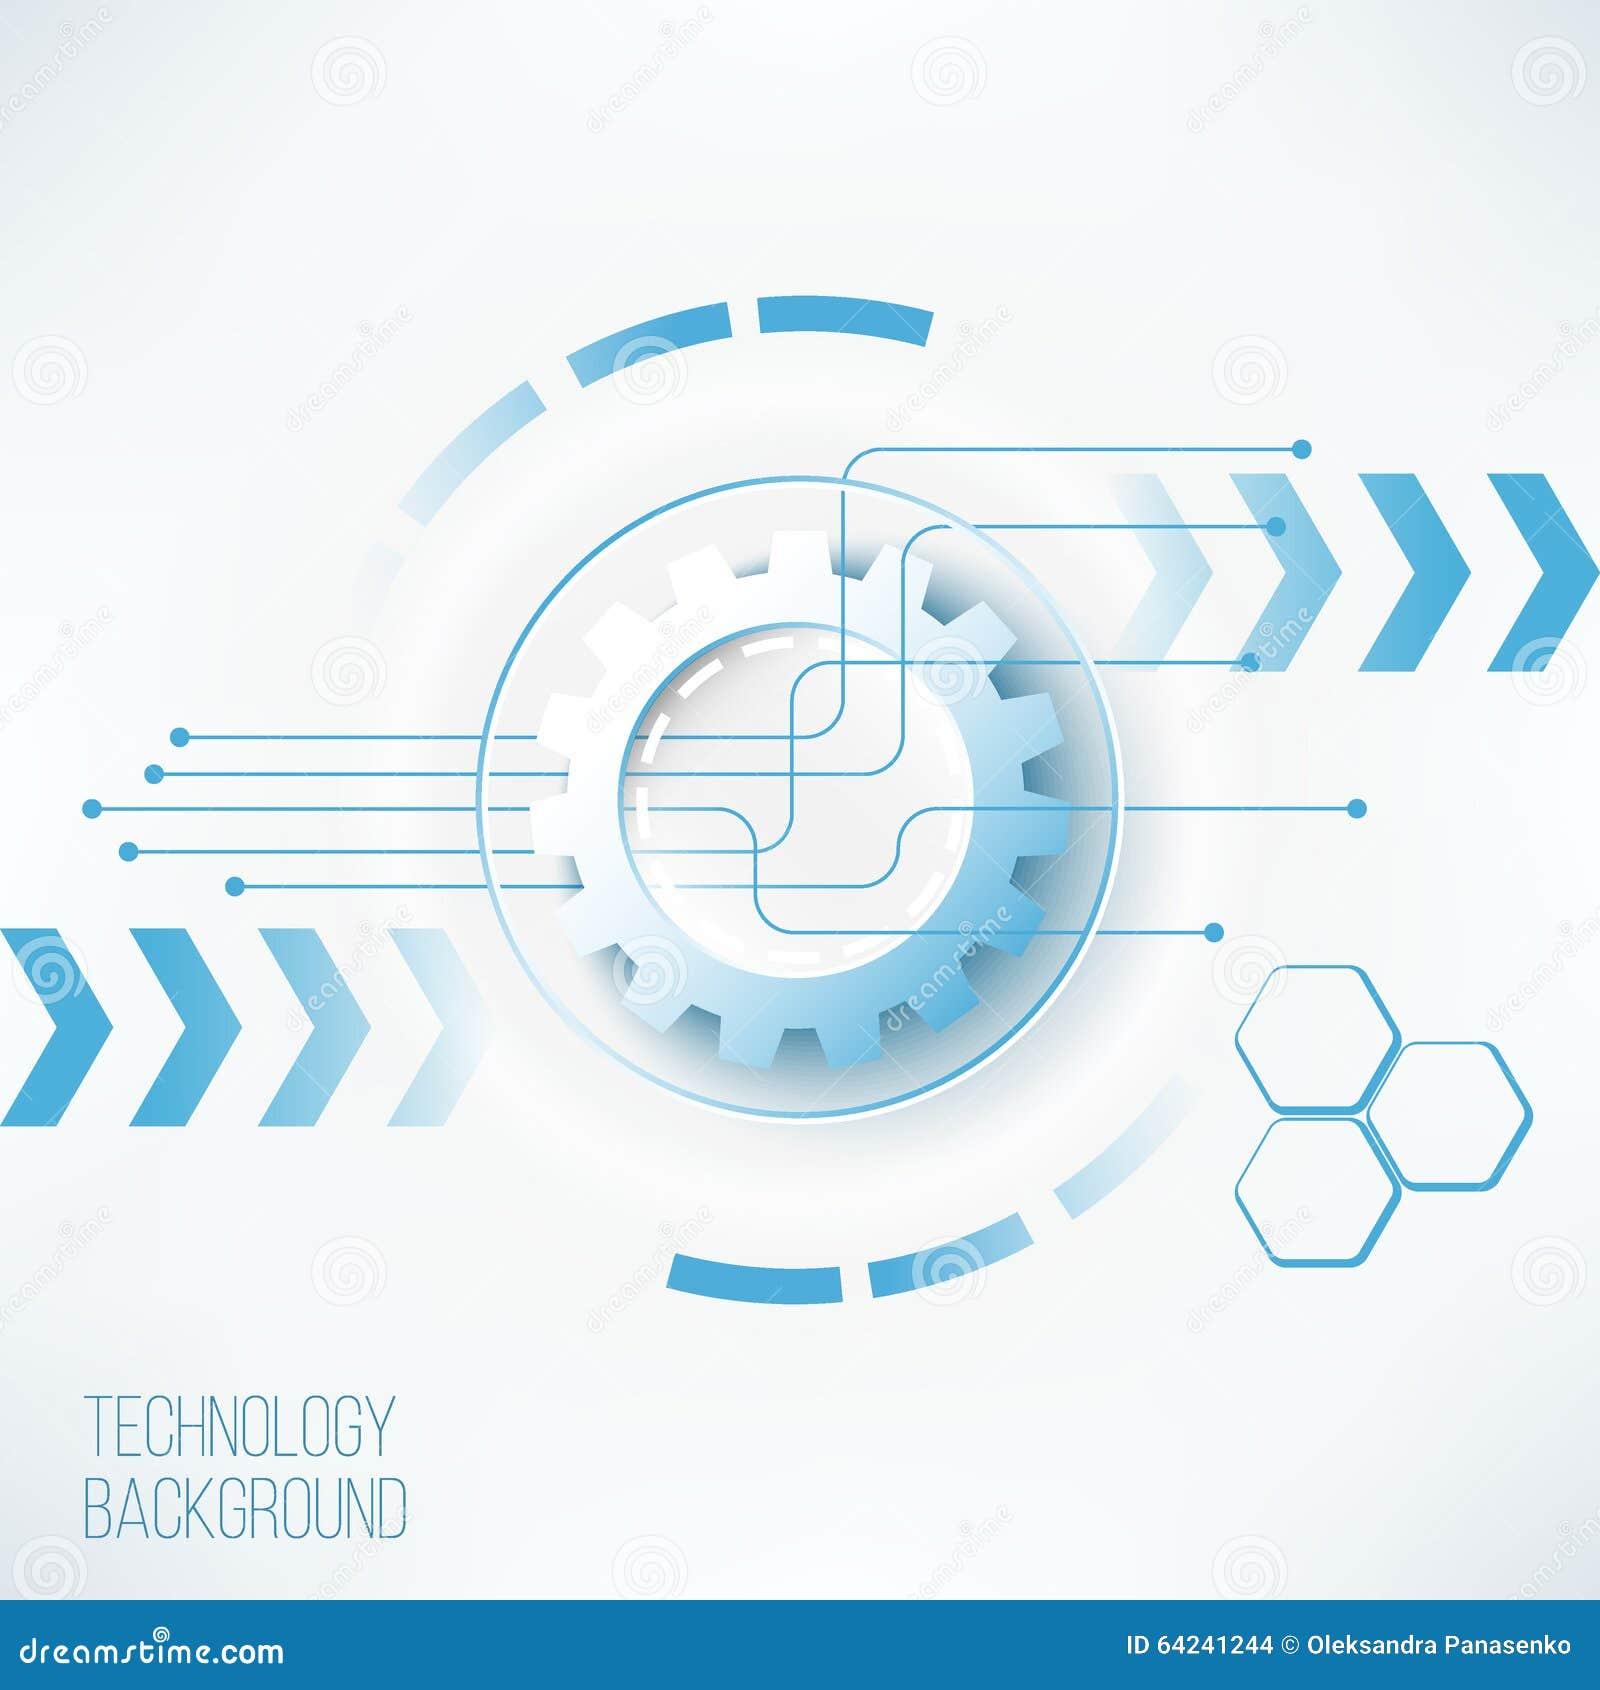 Futuristic technology gear concept